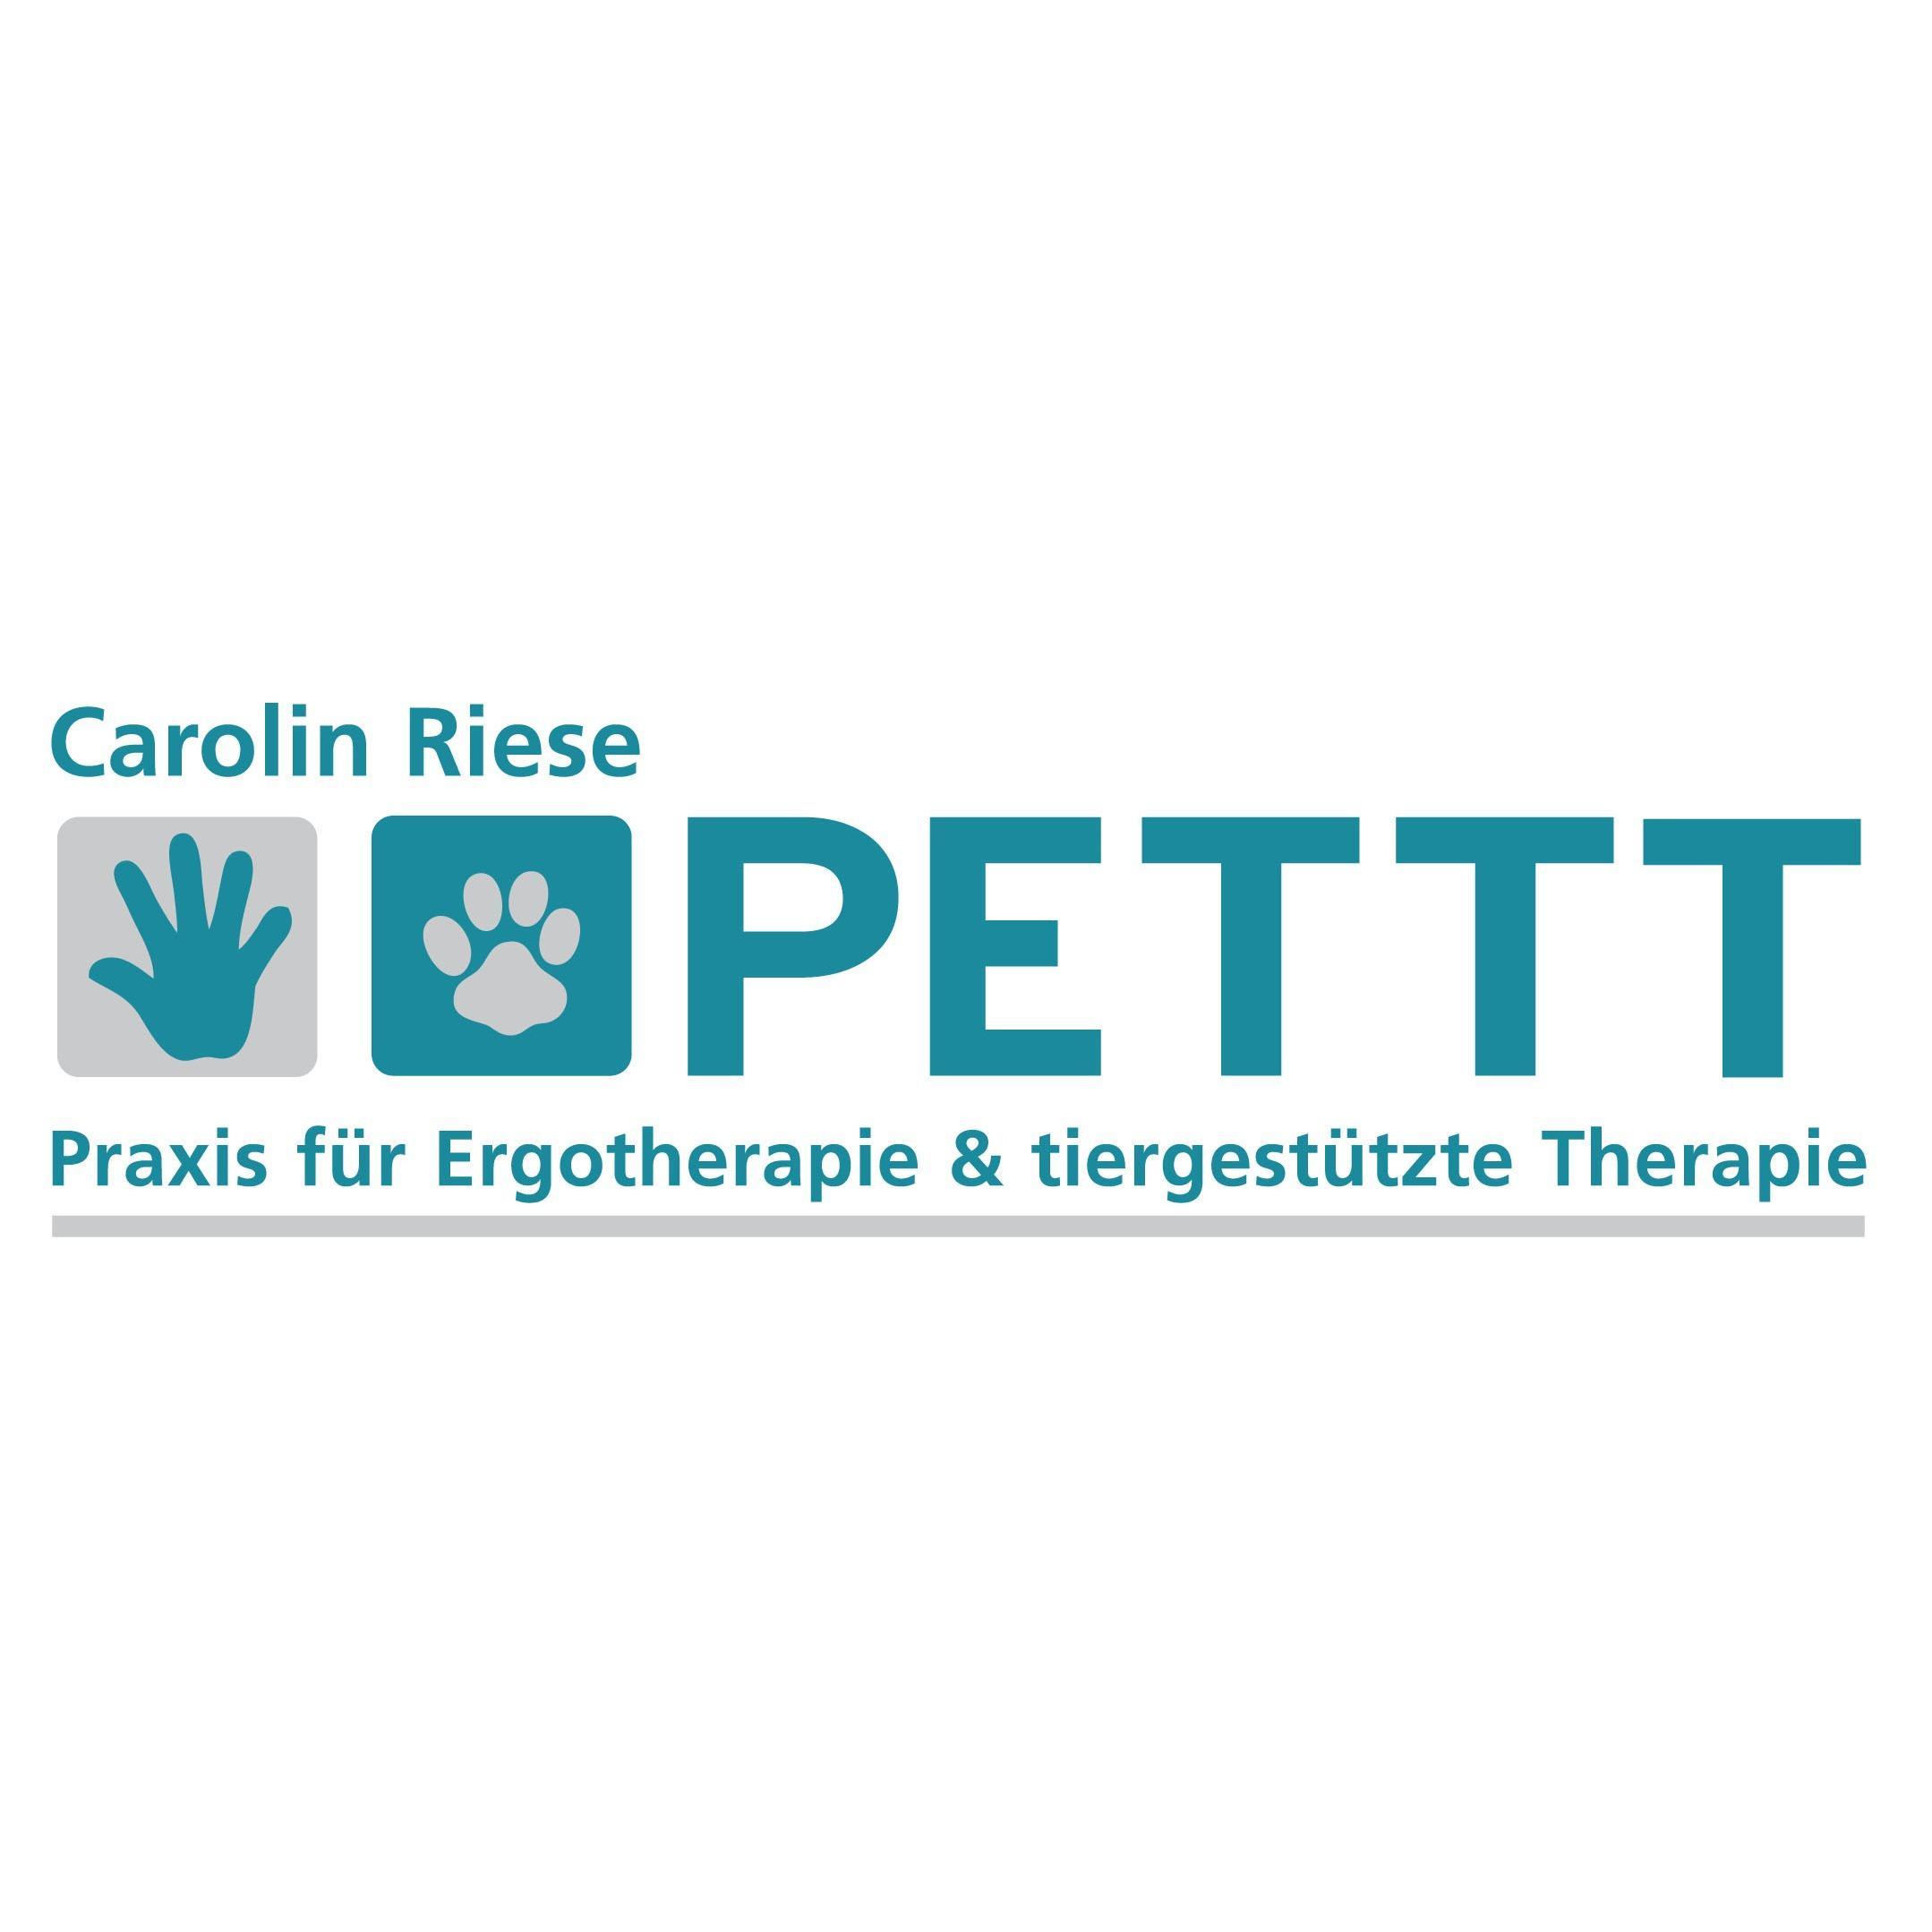 PETTT Carolin Riese